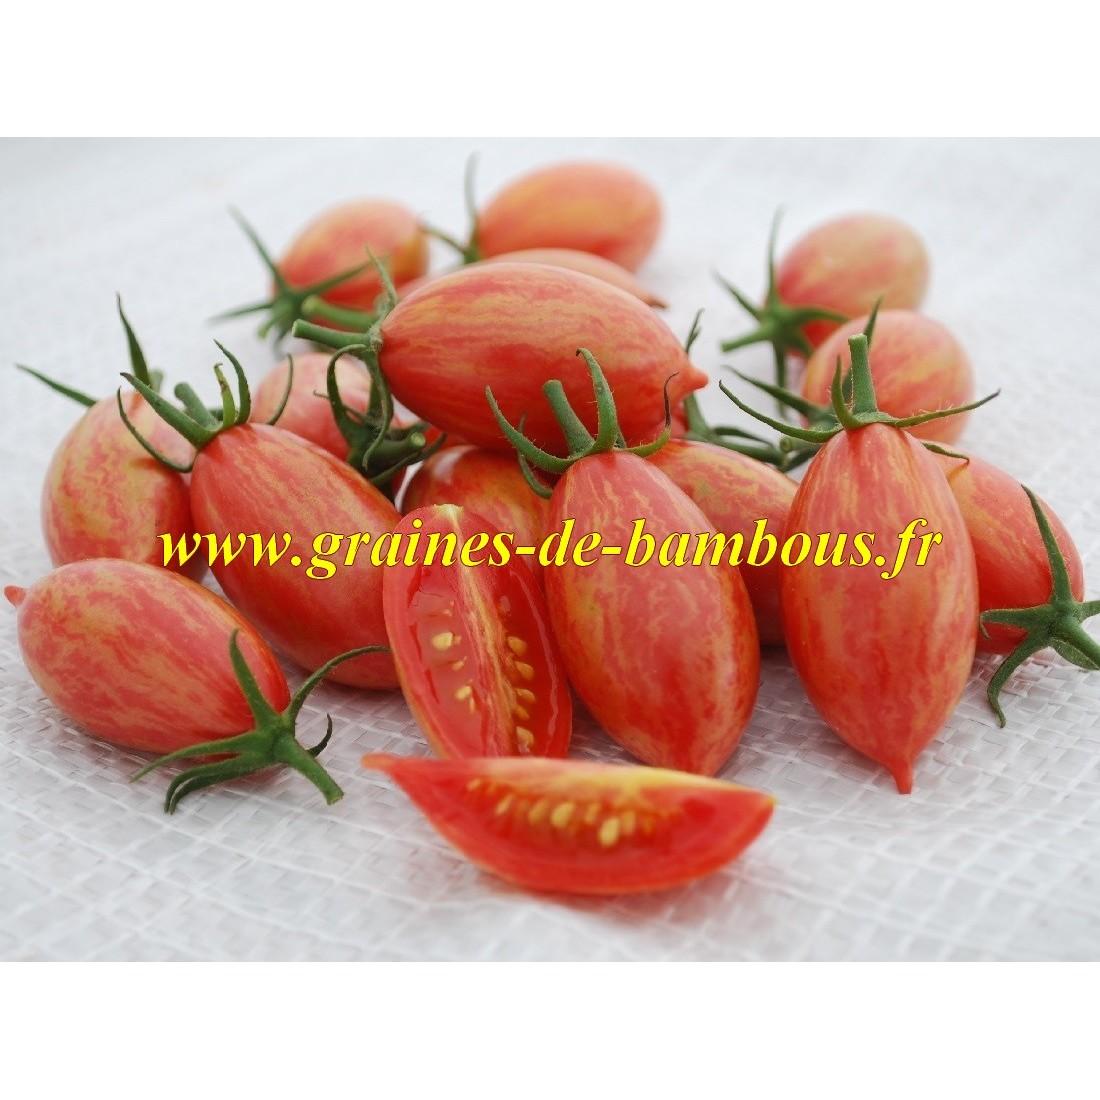 Tomate pink tiger graines de bambous fr